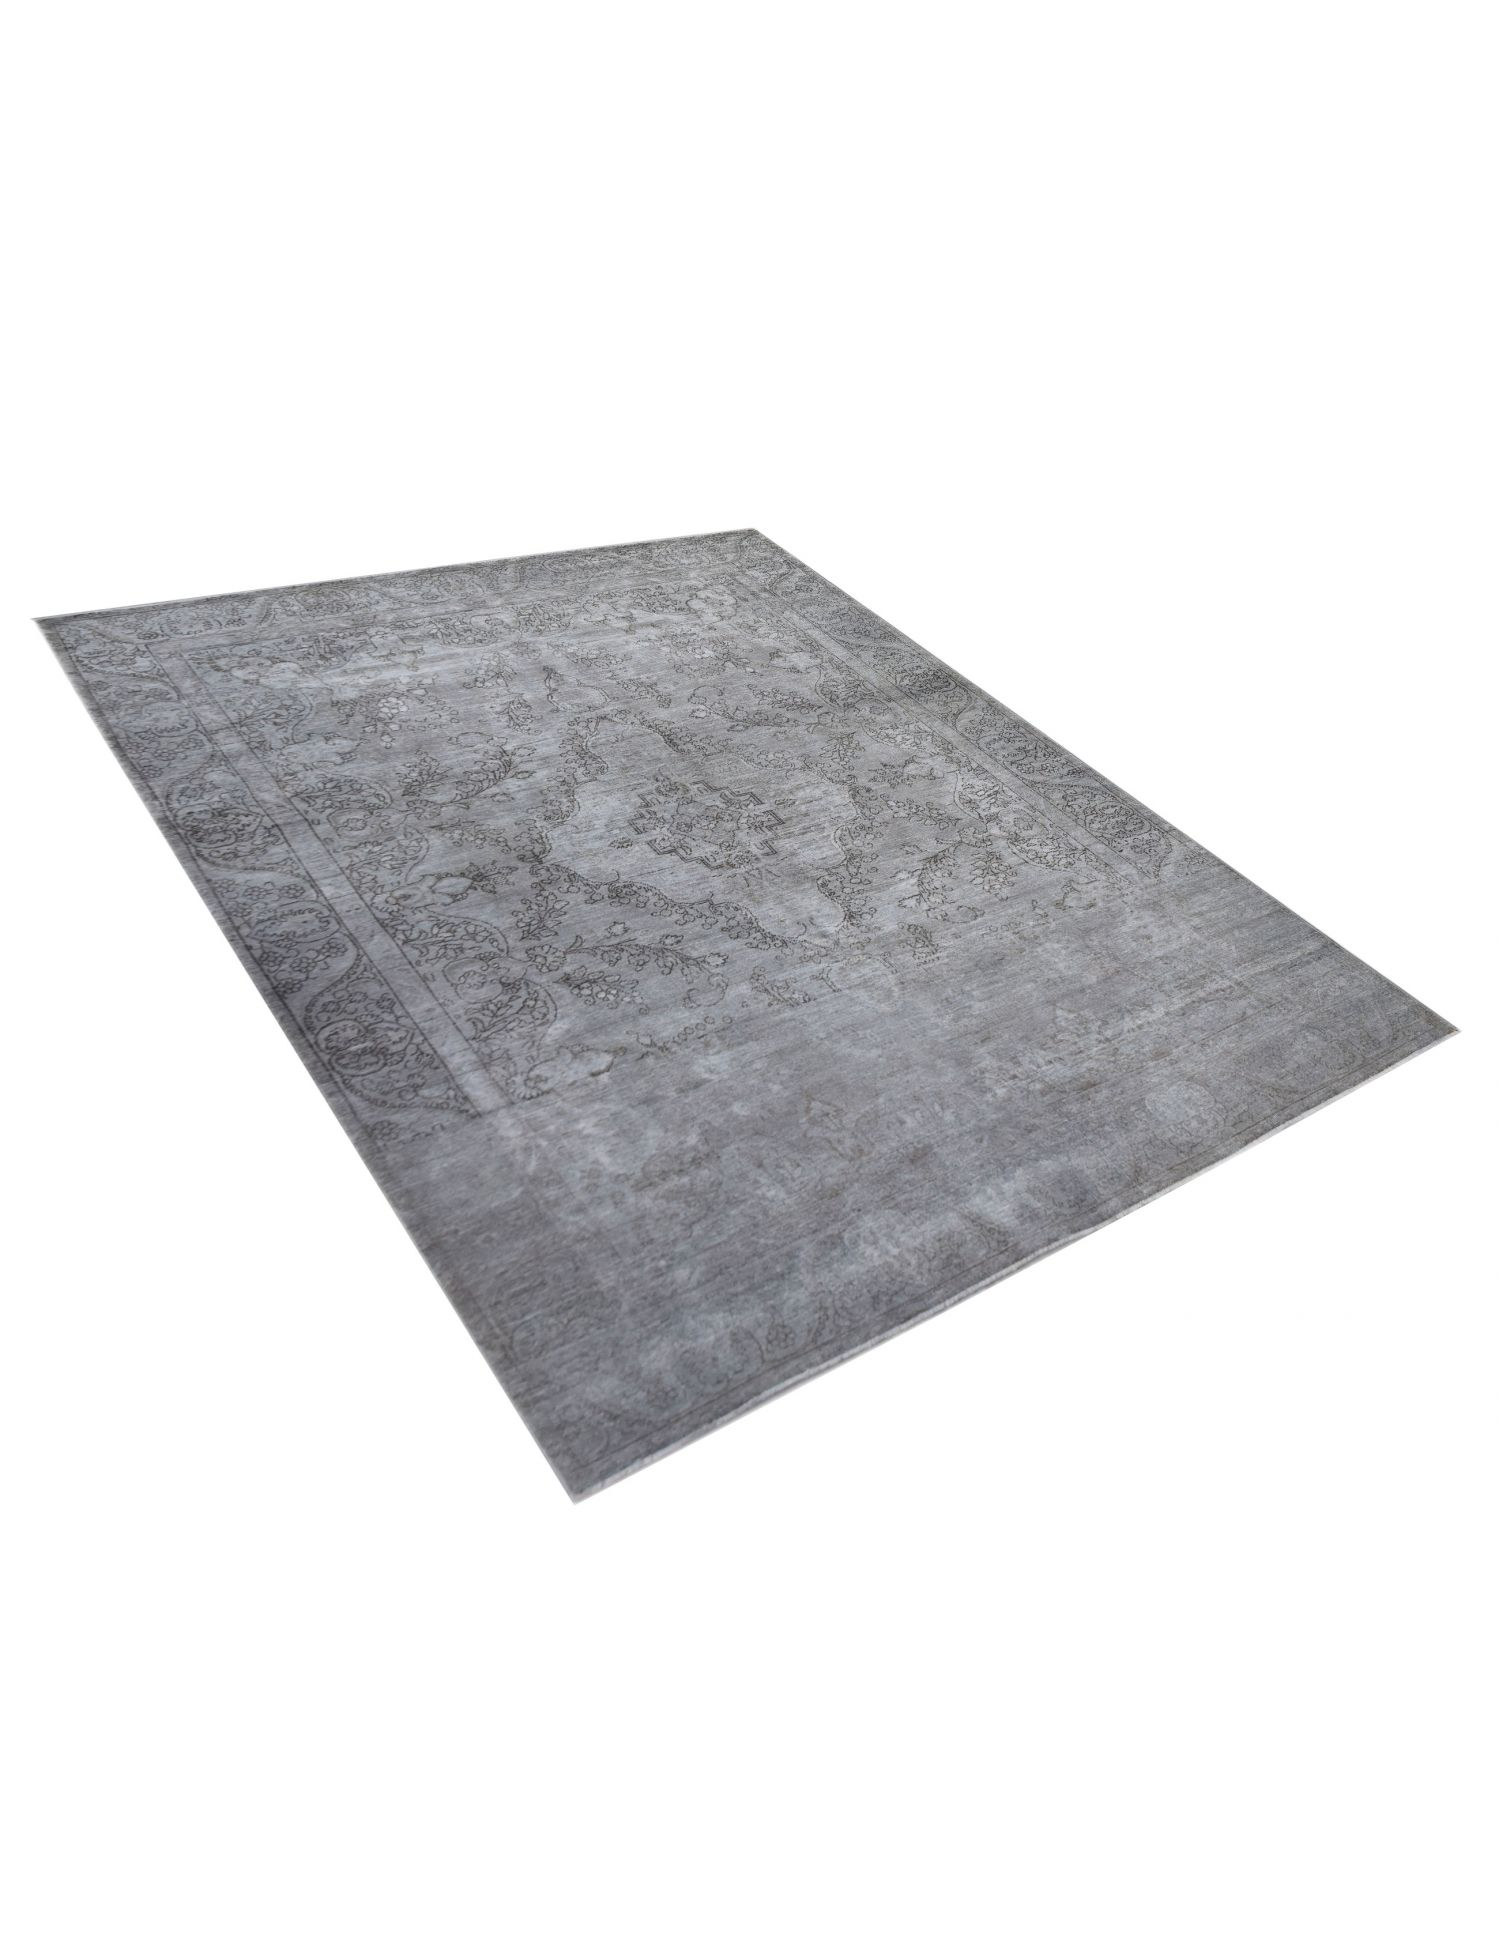 Vintage Perserteppich  grau <br/>380 x 277 cm